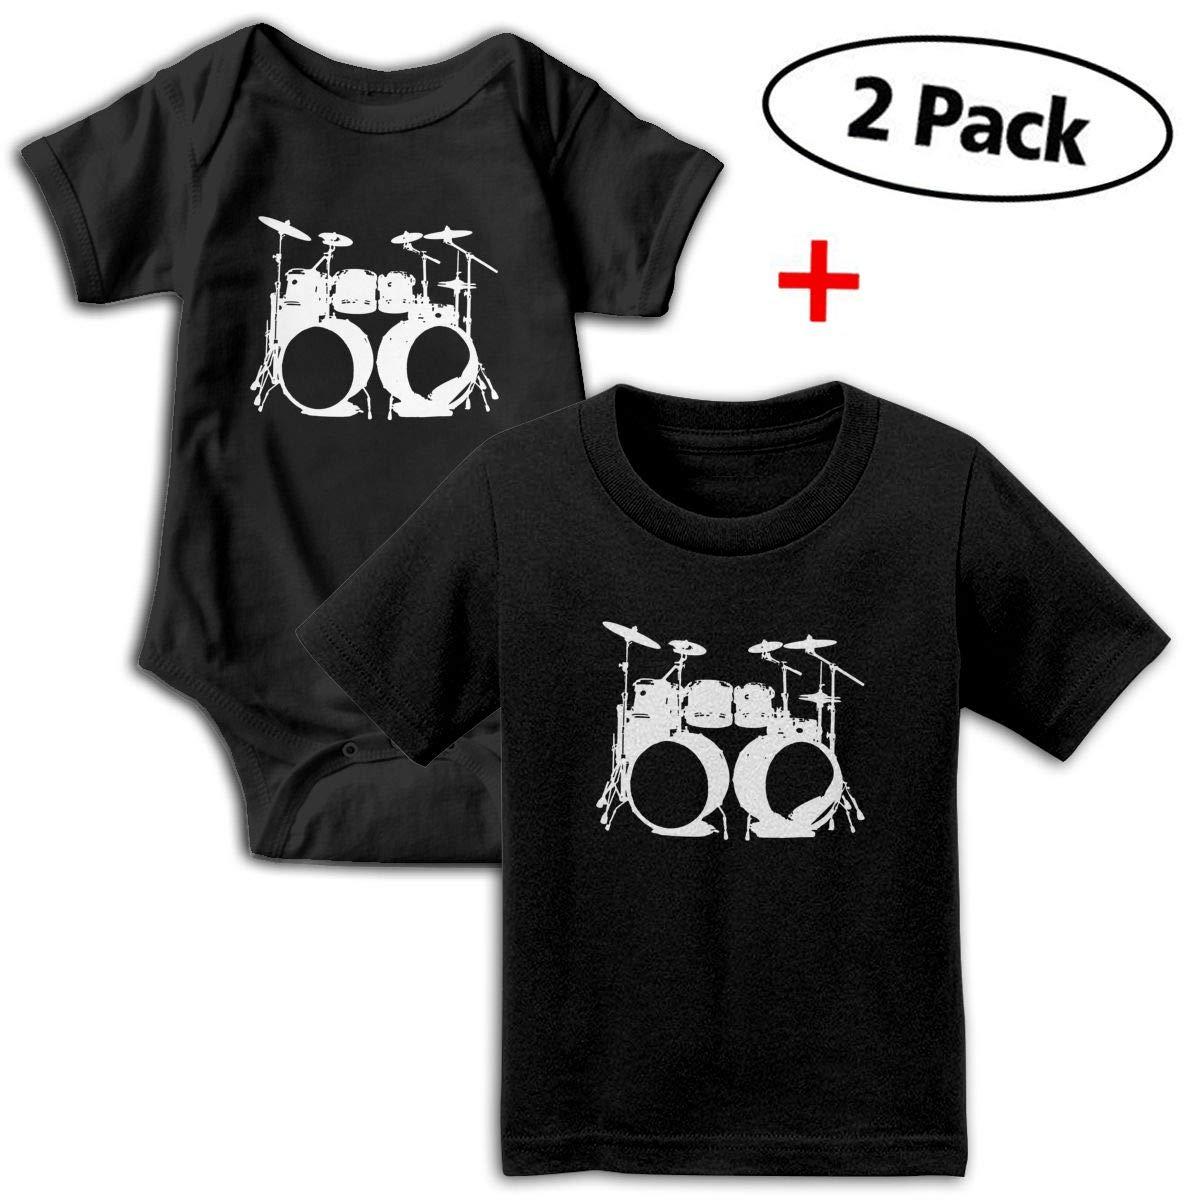 Drums Babys Boys /& Girls Short Sleeve Bodysuit Baby Onesie And Tshirt